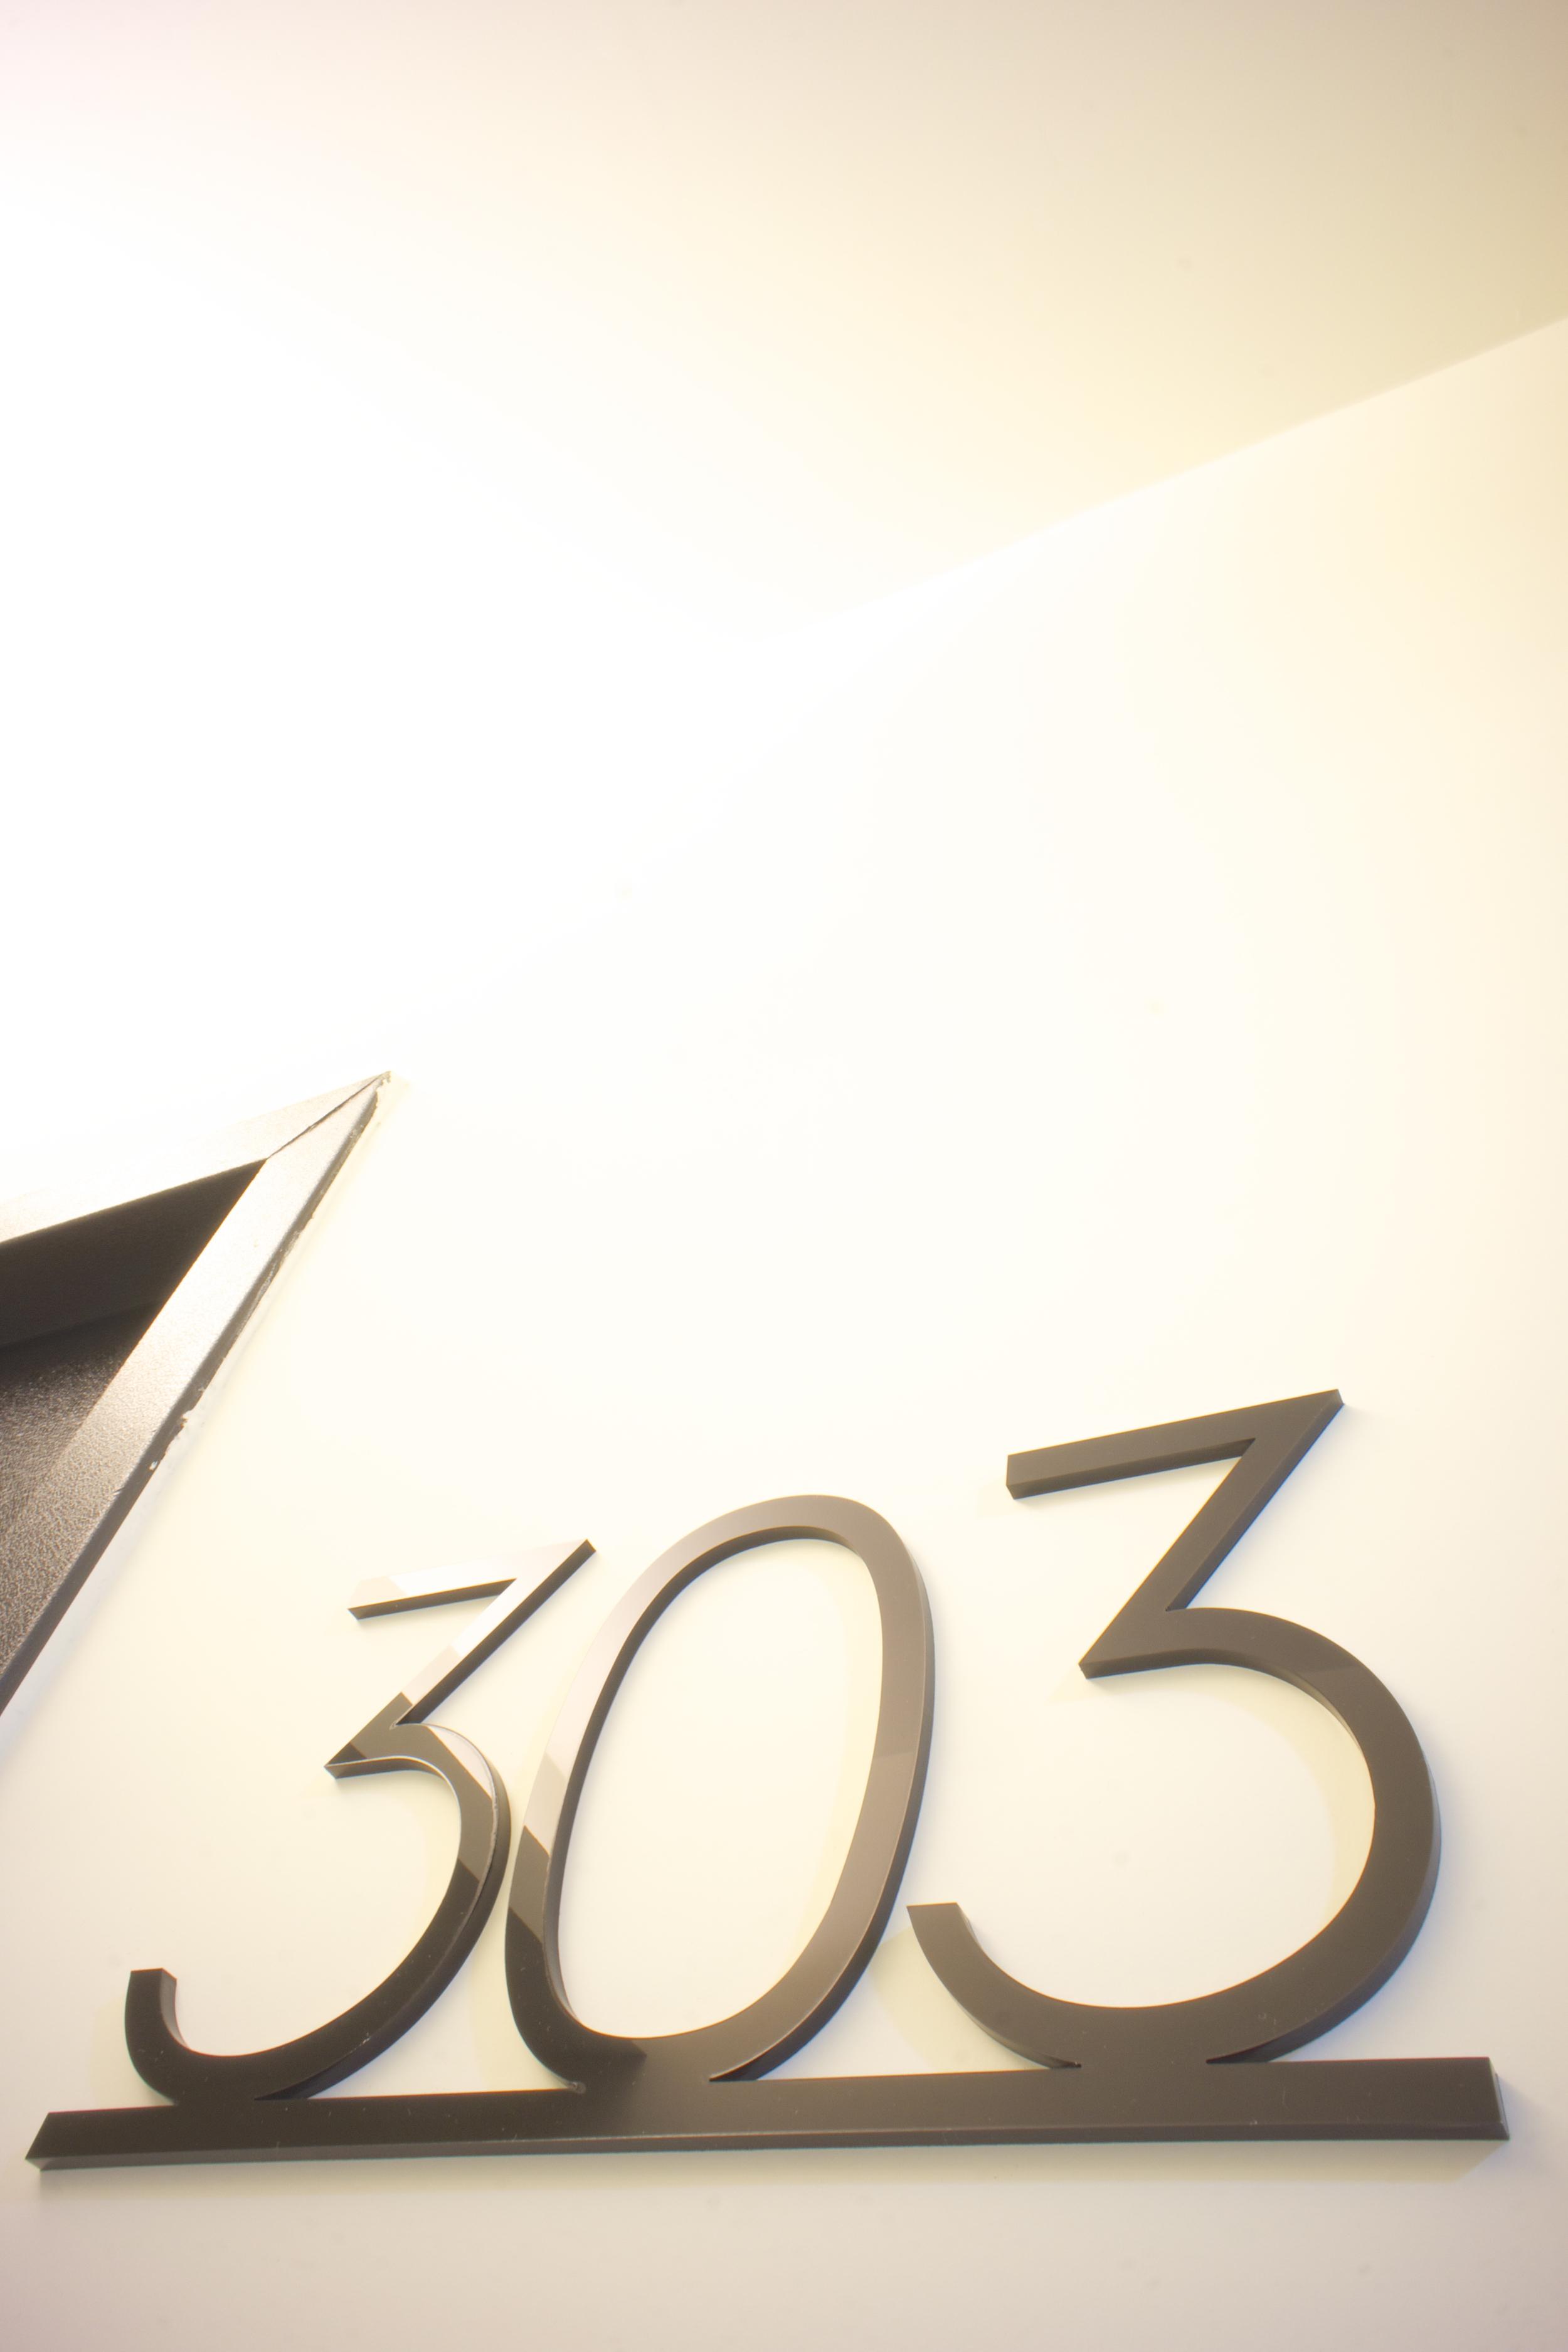 DSC02690.jpg